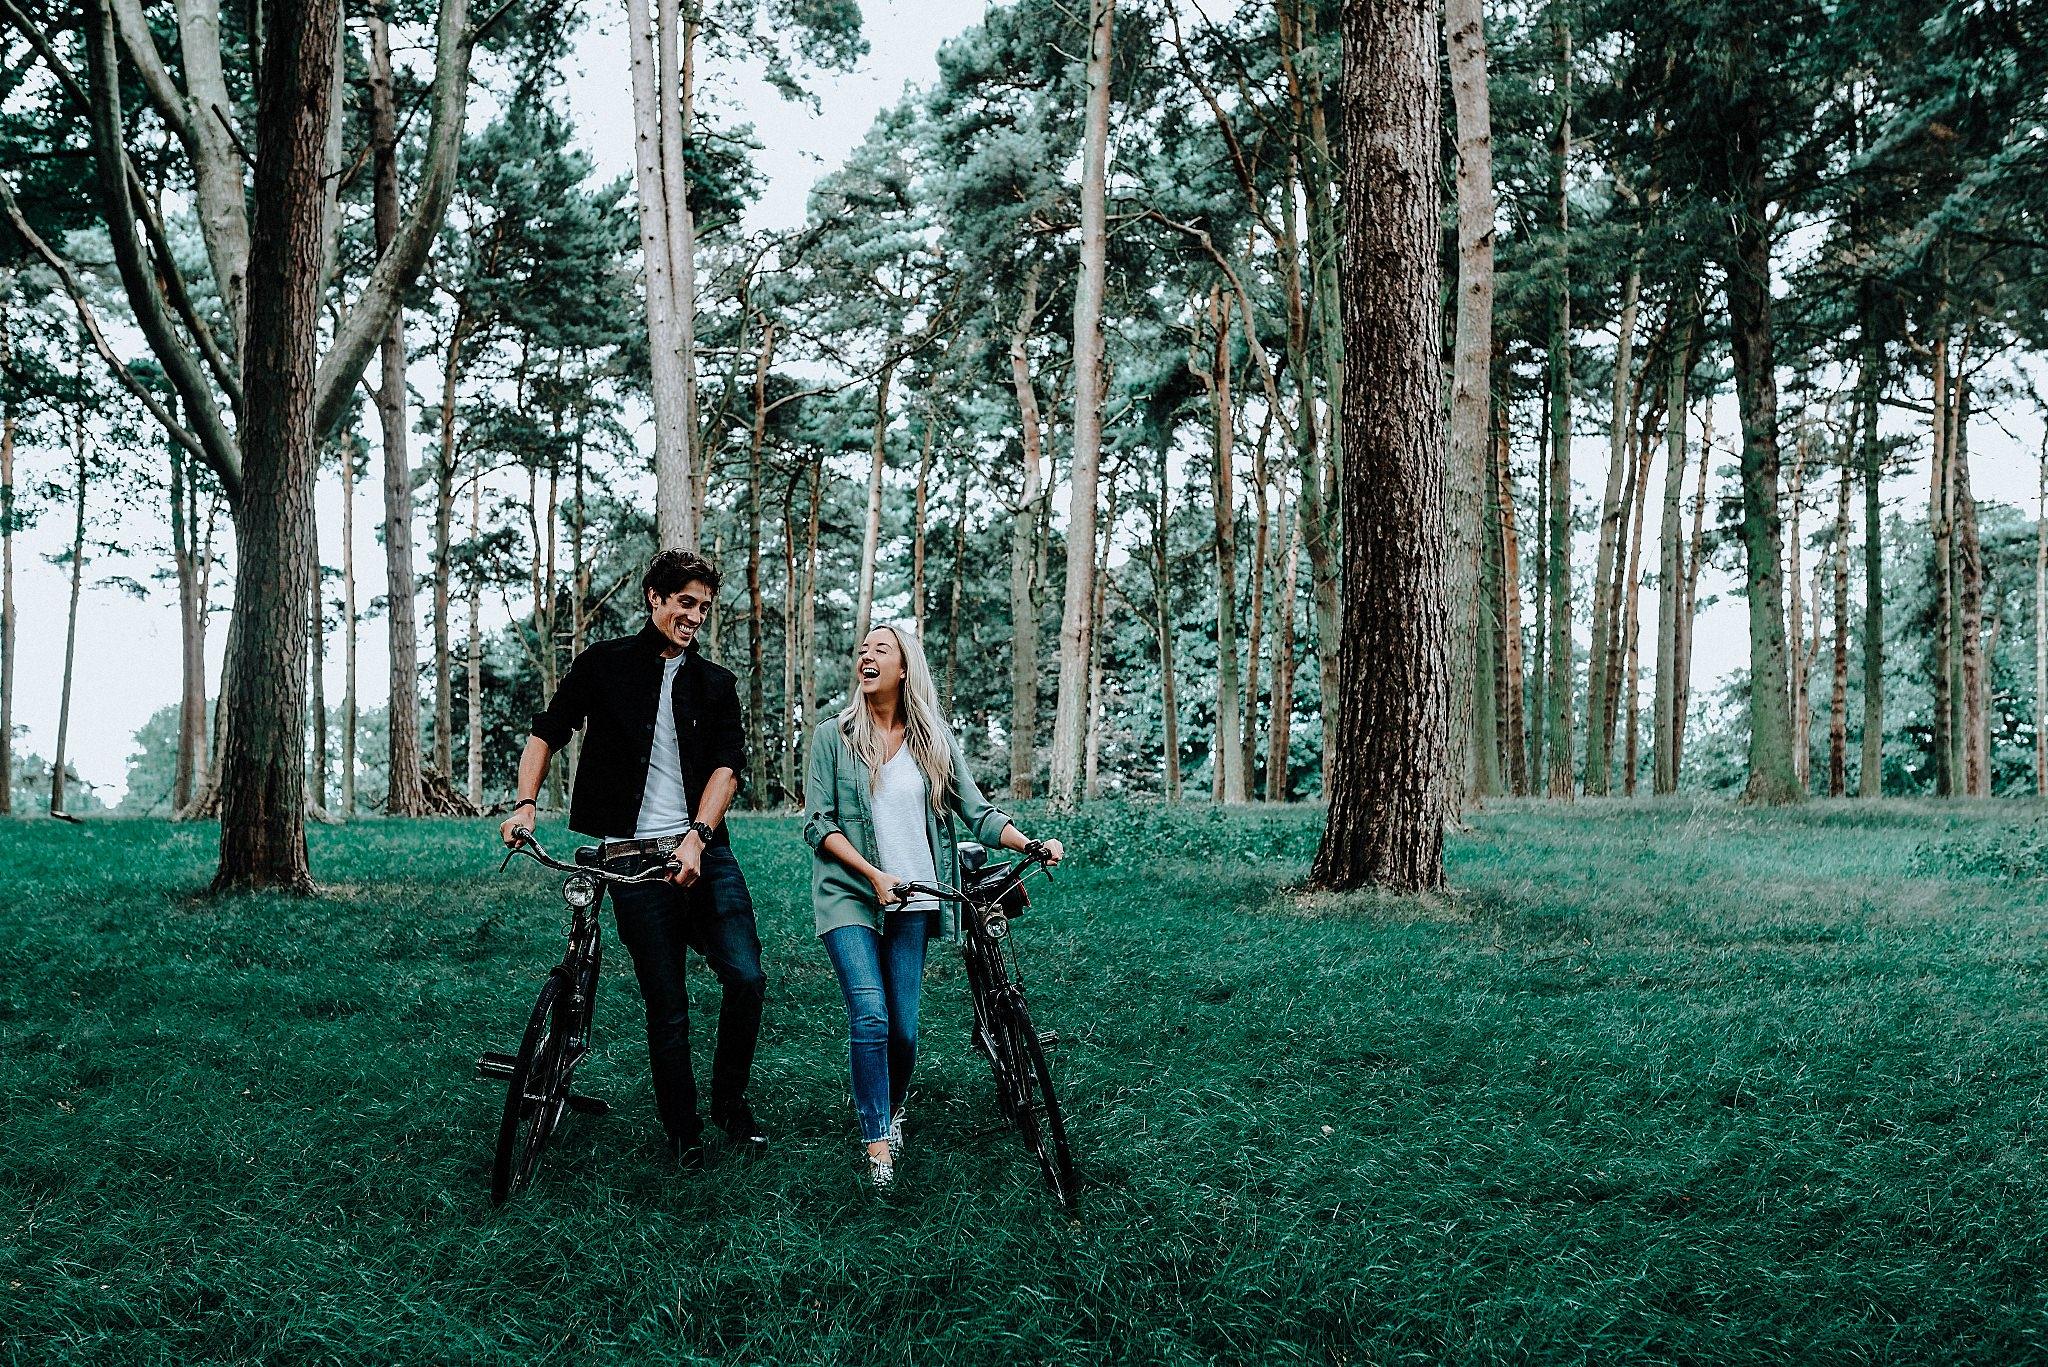 Lauren & Christopher walking through Tatton Park with their vintage bikes